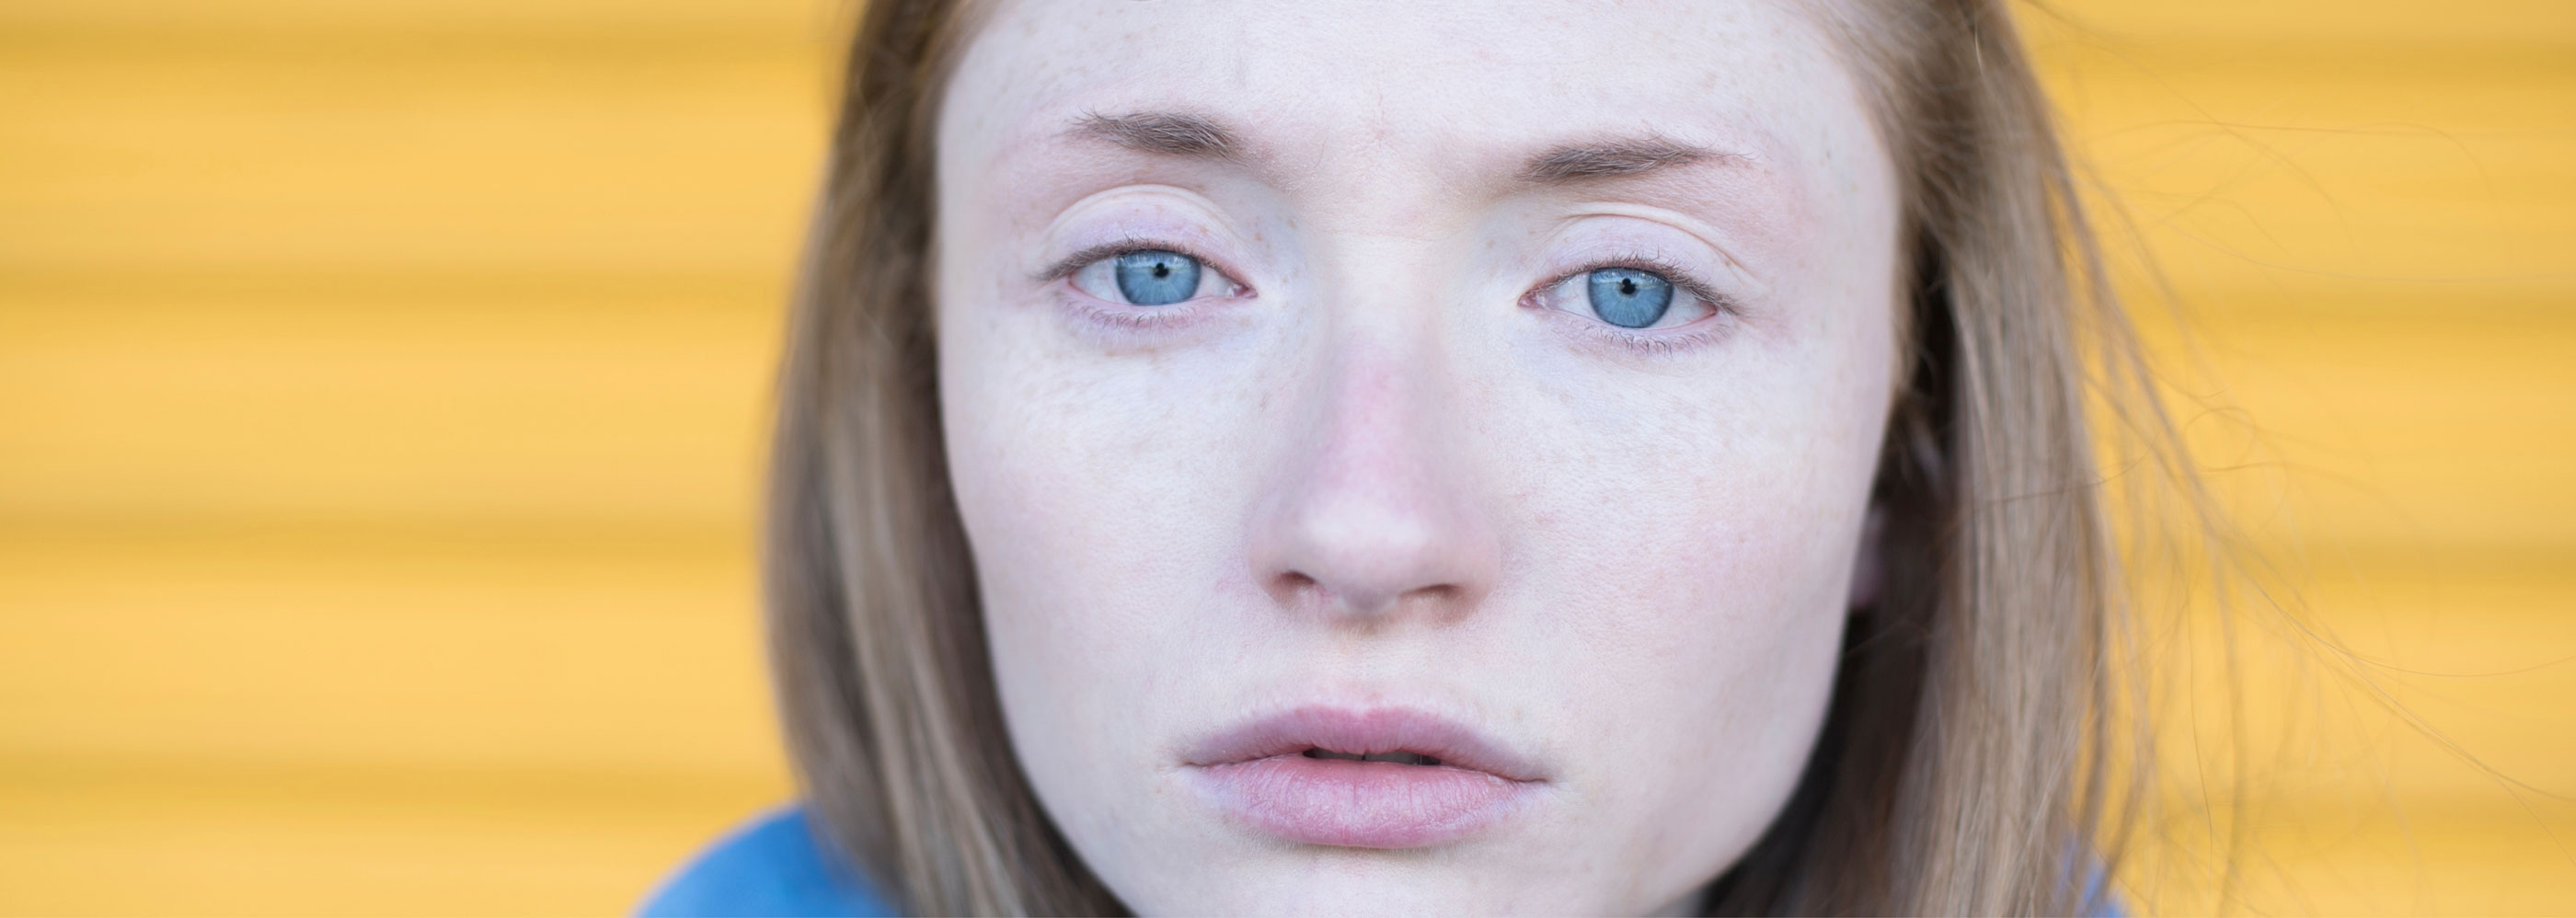 Novas Ireland Womens Stories Video and Photography Production Concept Development